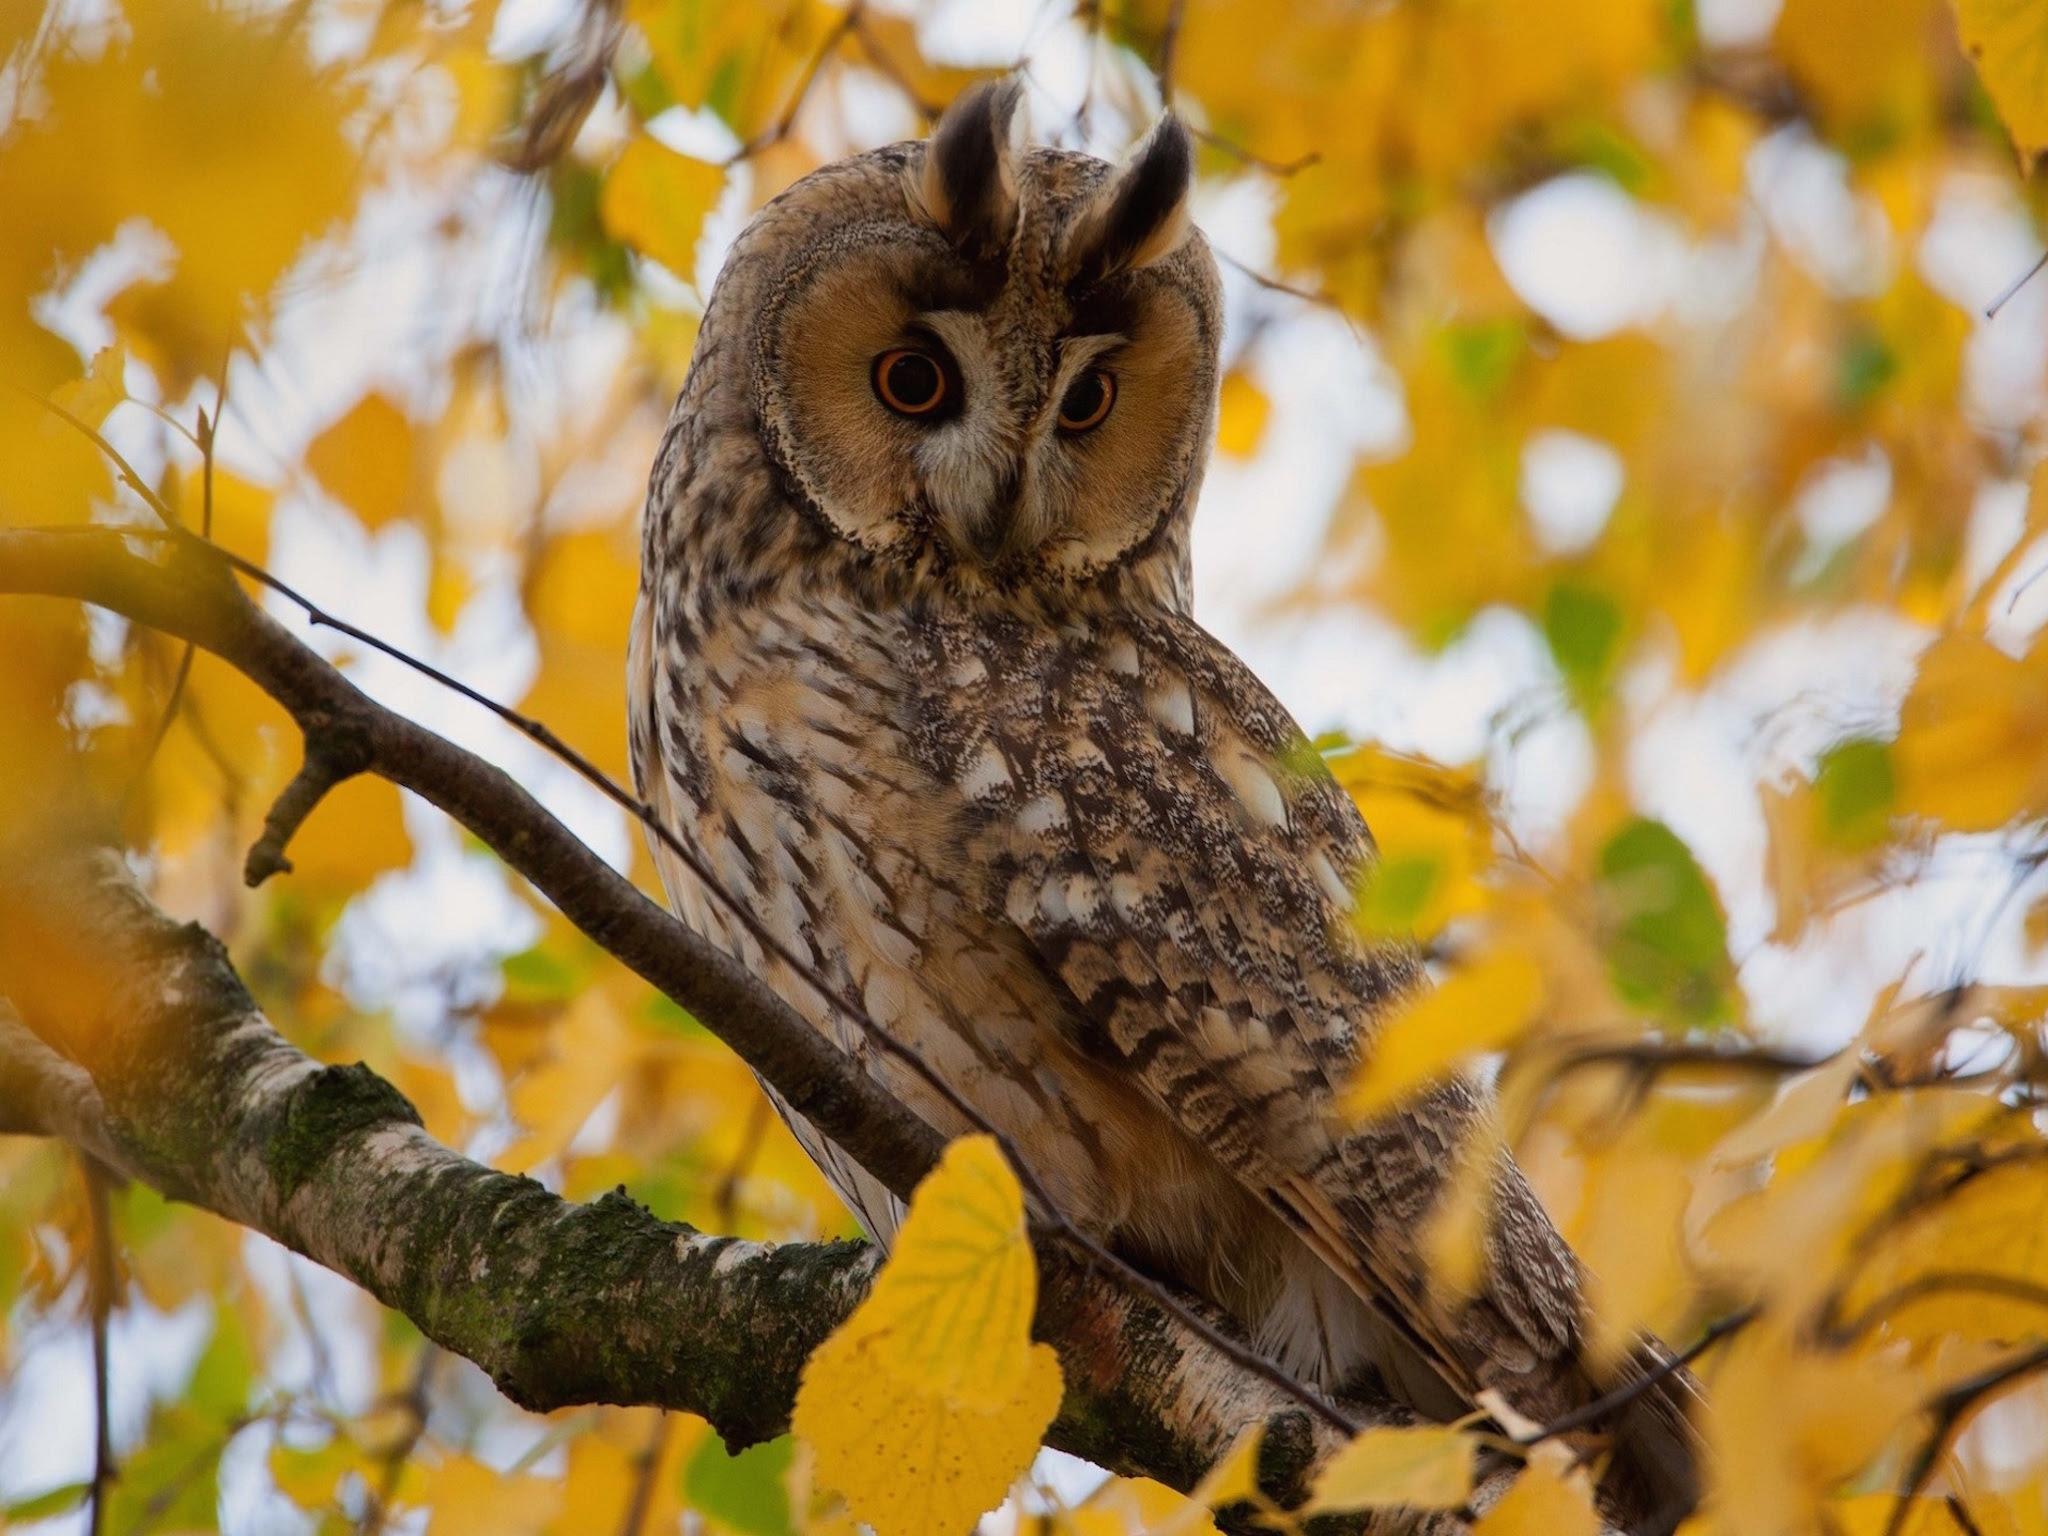 Autumn Owl Wallpaper  Free Autumn Backgrounds